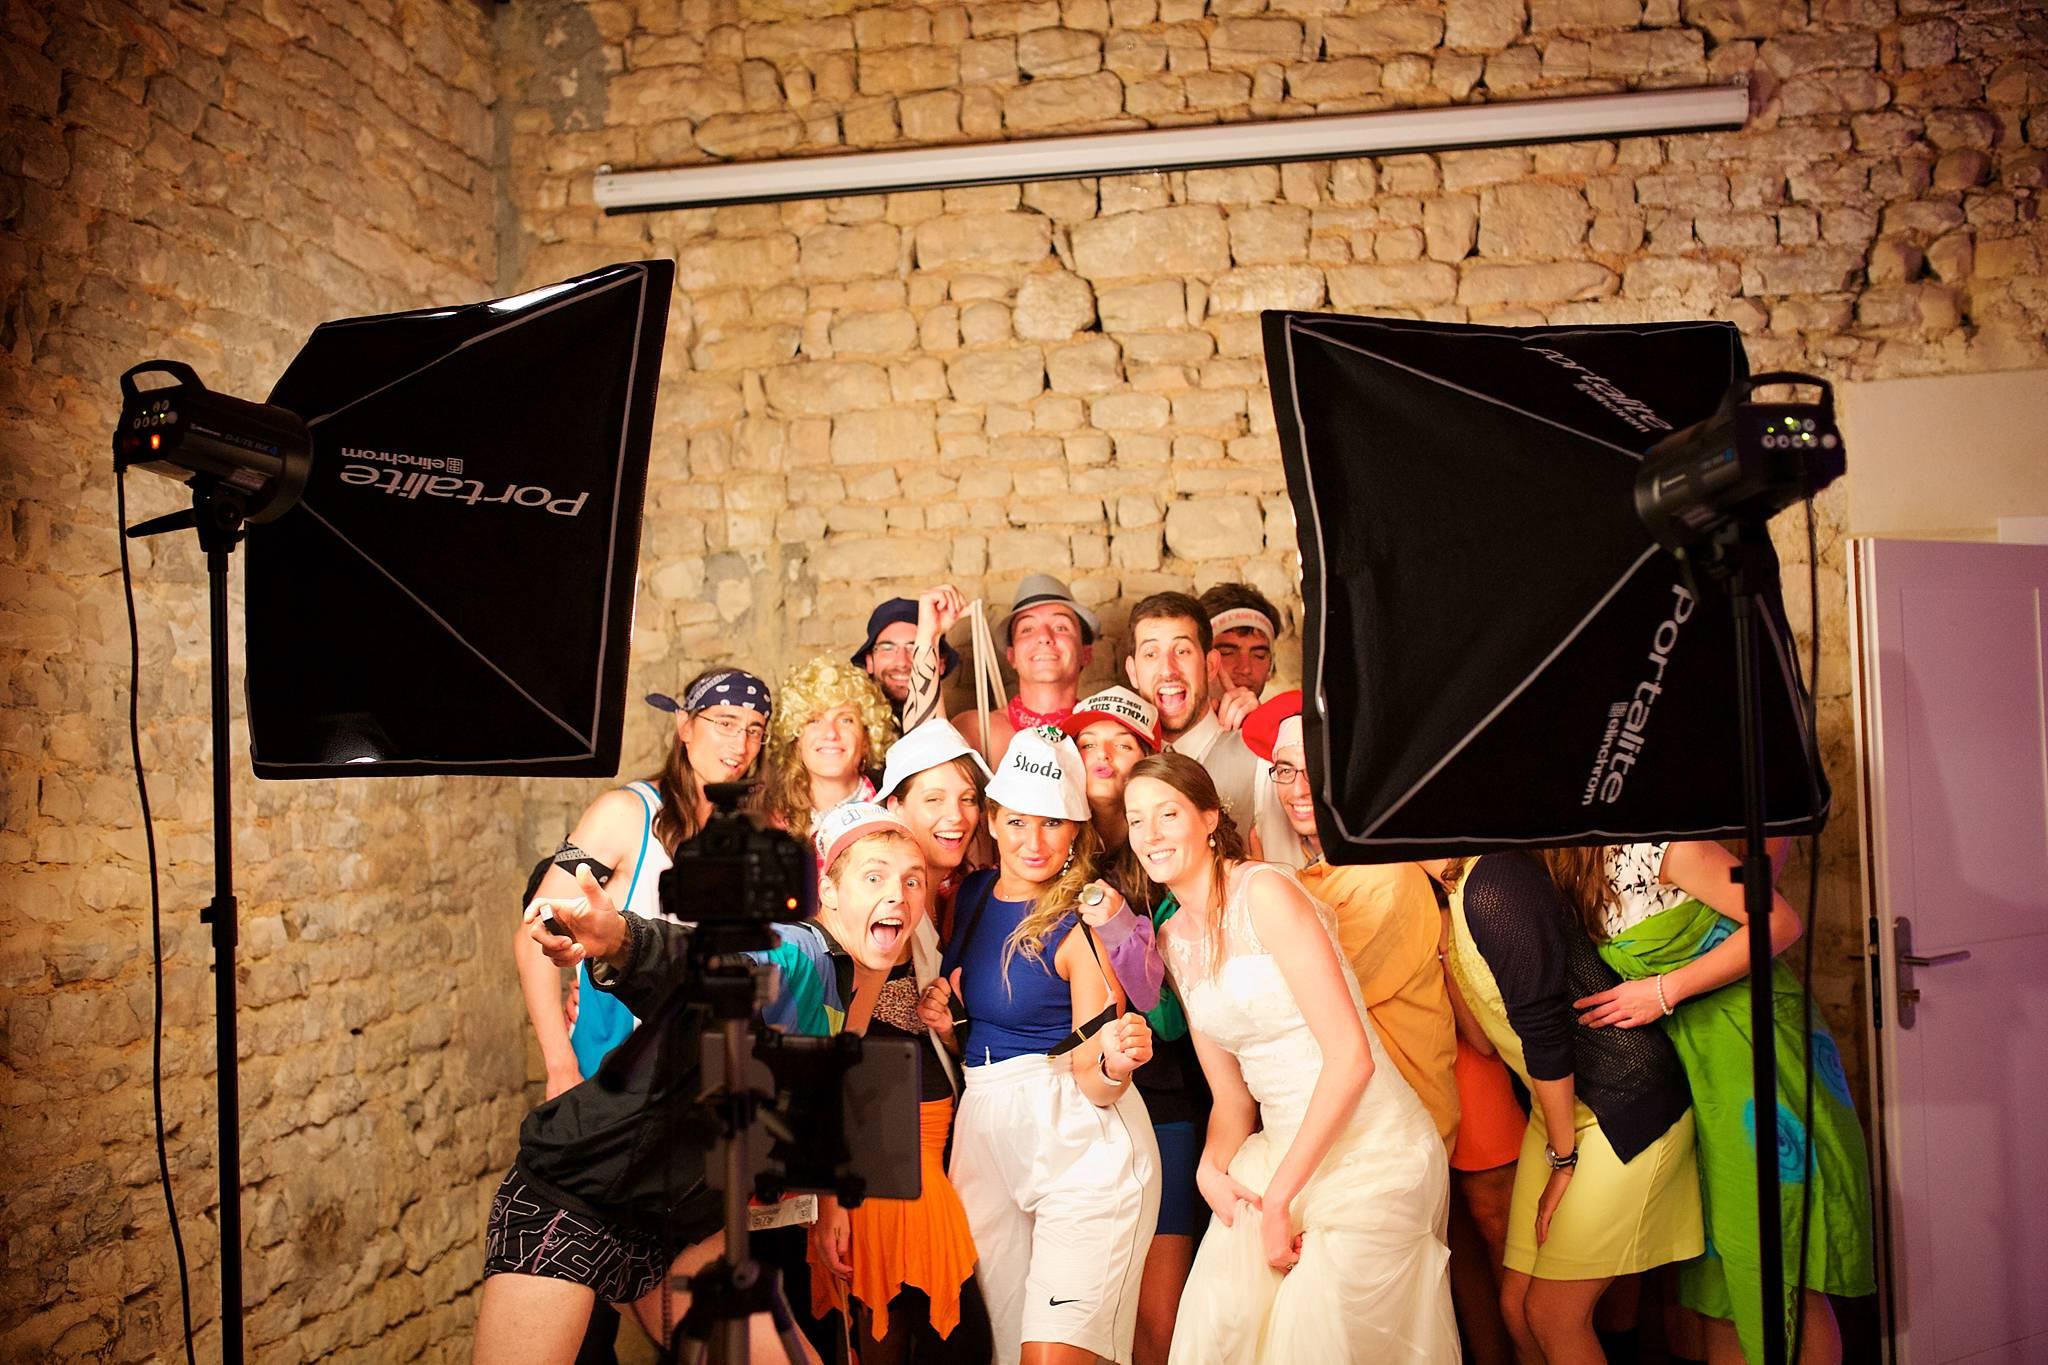 02_photobooth-mariage-backstage-bordeaux-gironde-dordogne-charentes-alexandre-roschewitz-photographies_2048px